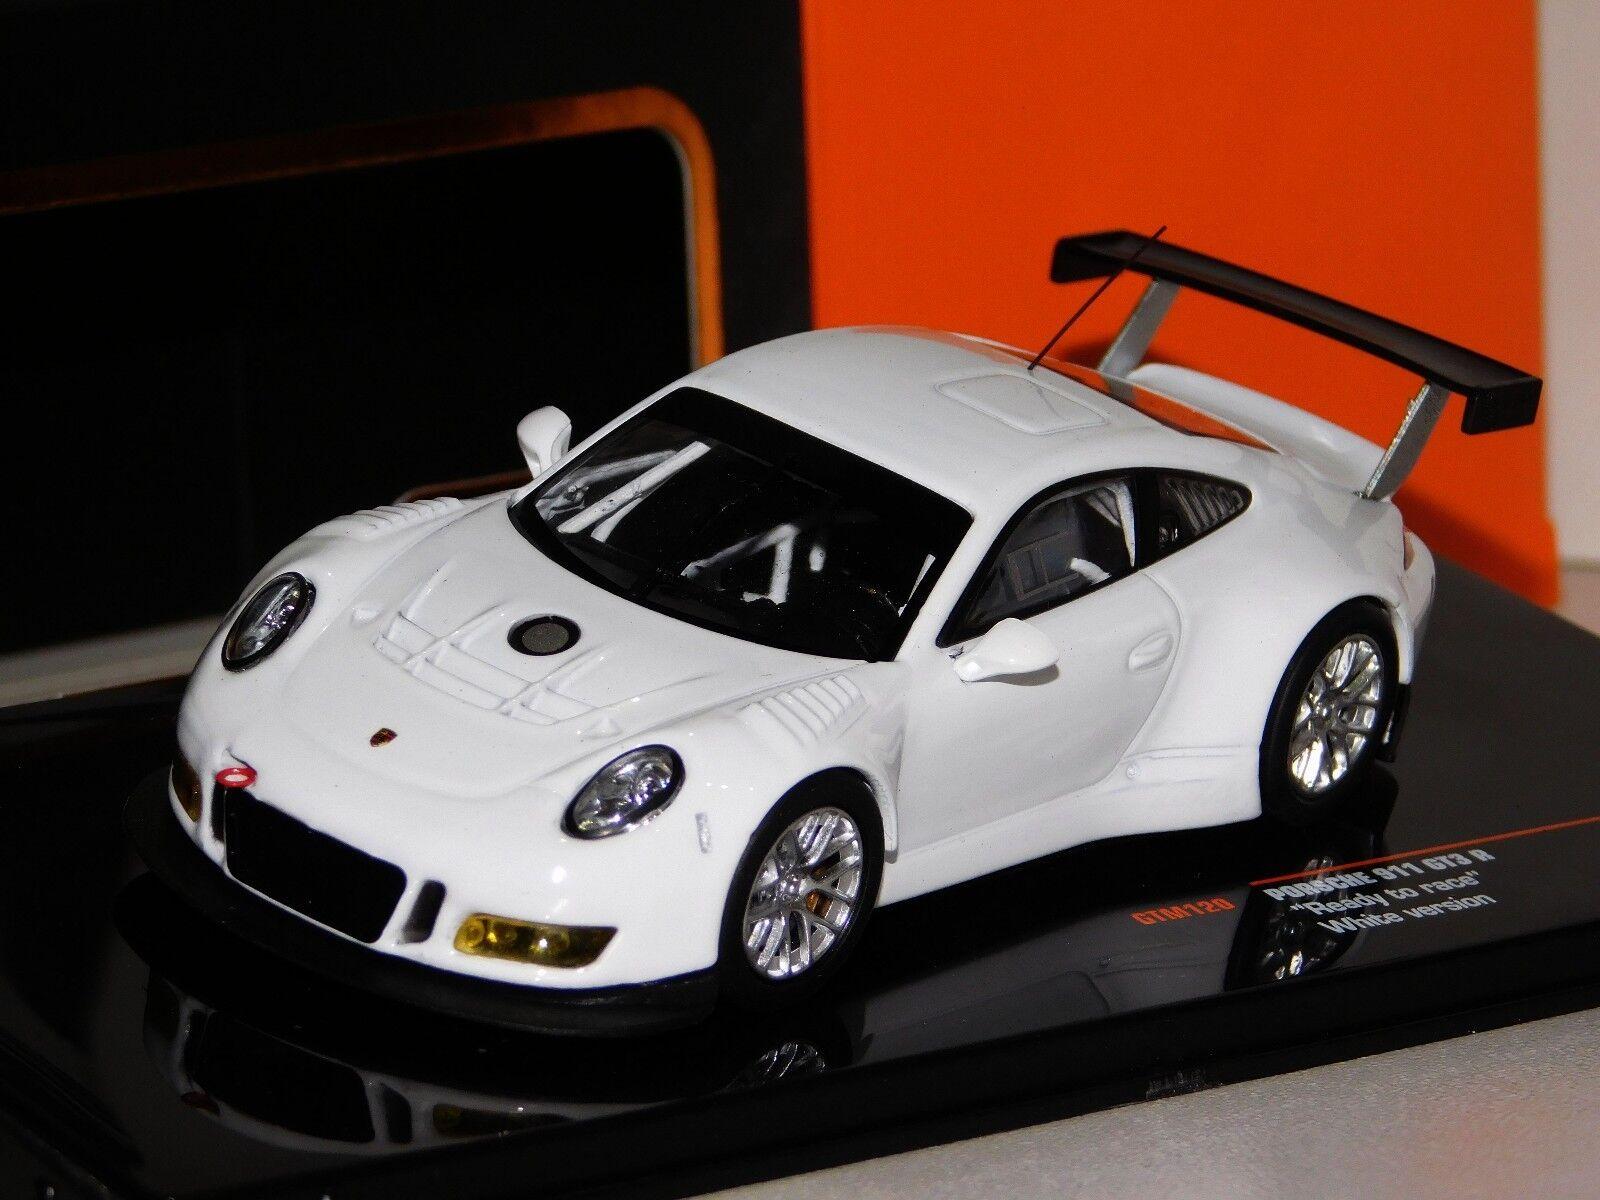 PORSCHE 911 GT3R READY TO RACE PLAIN BODY VERSION WHITE  IXO GTM120 1 43